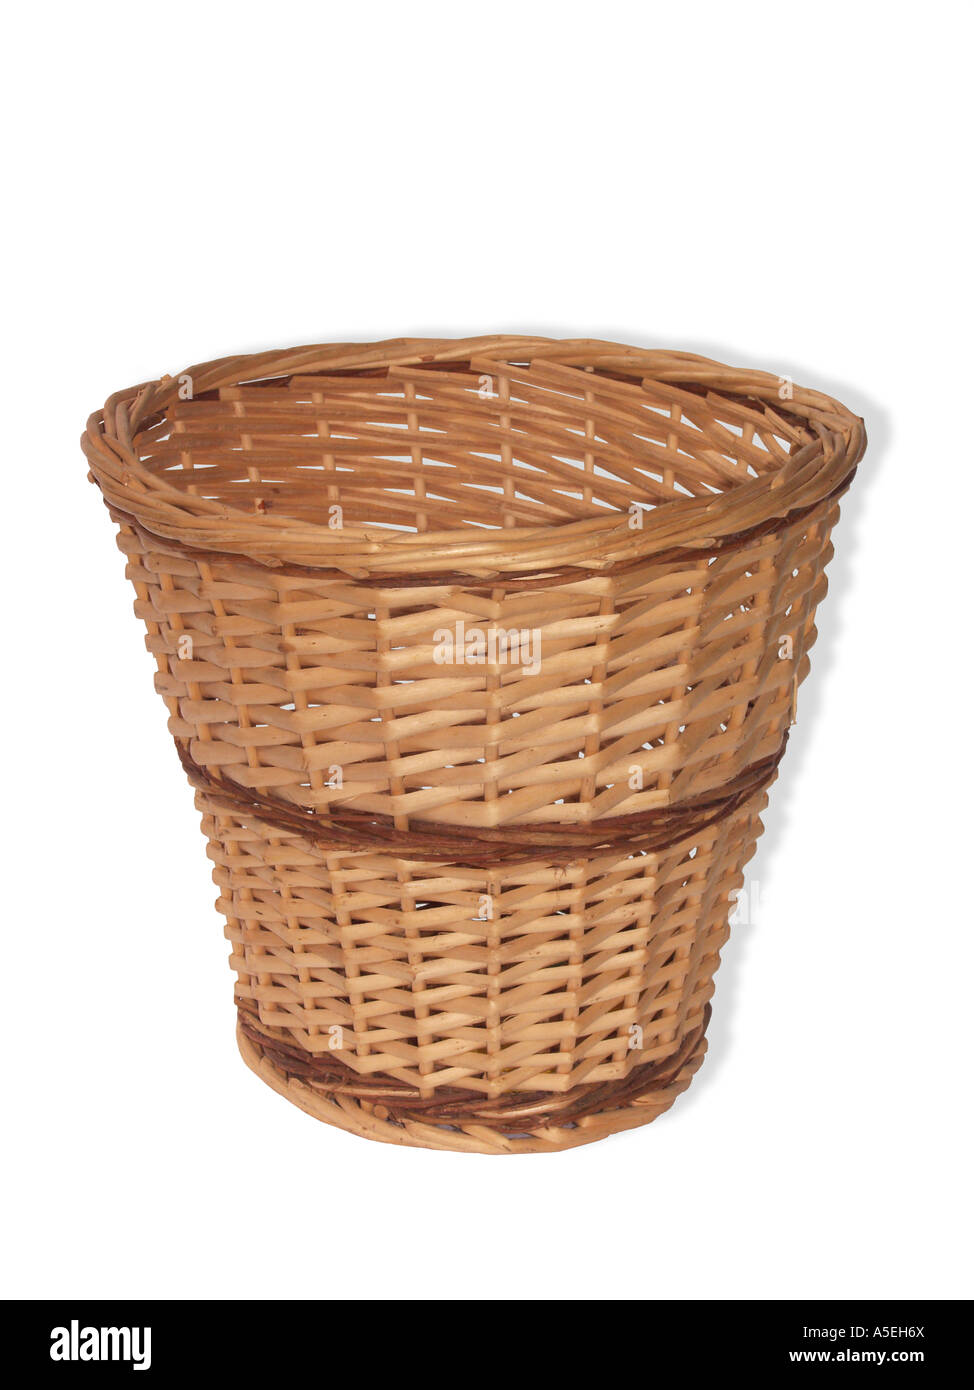 Woven cane wastepaper basket on white background - Stock Image